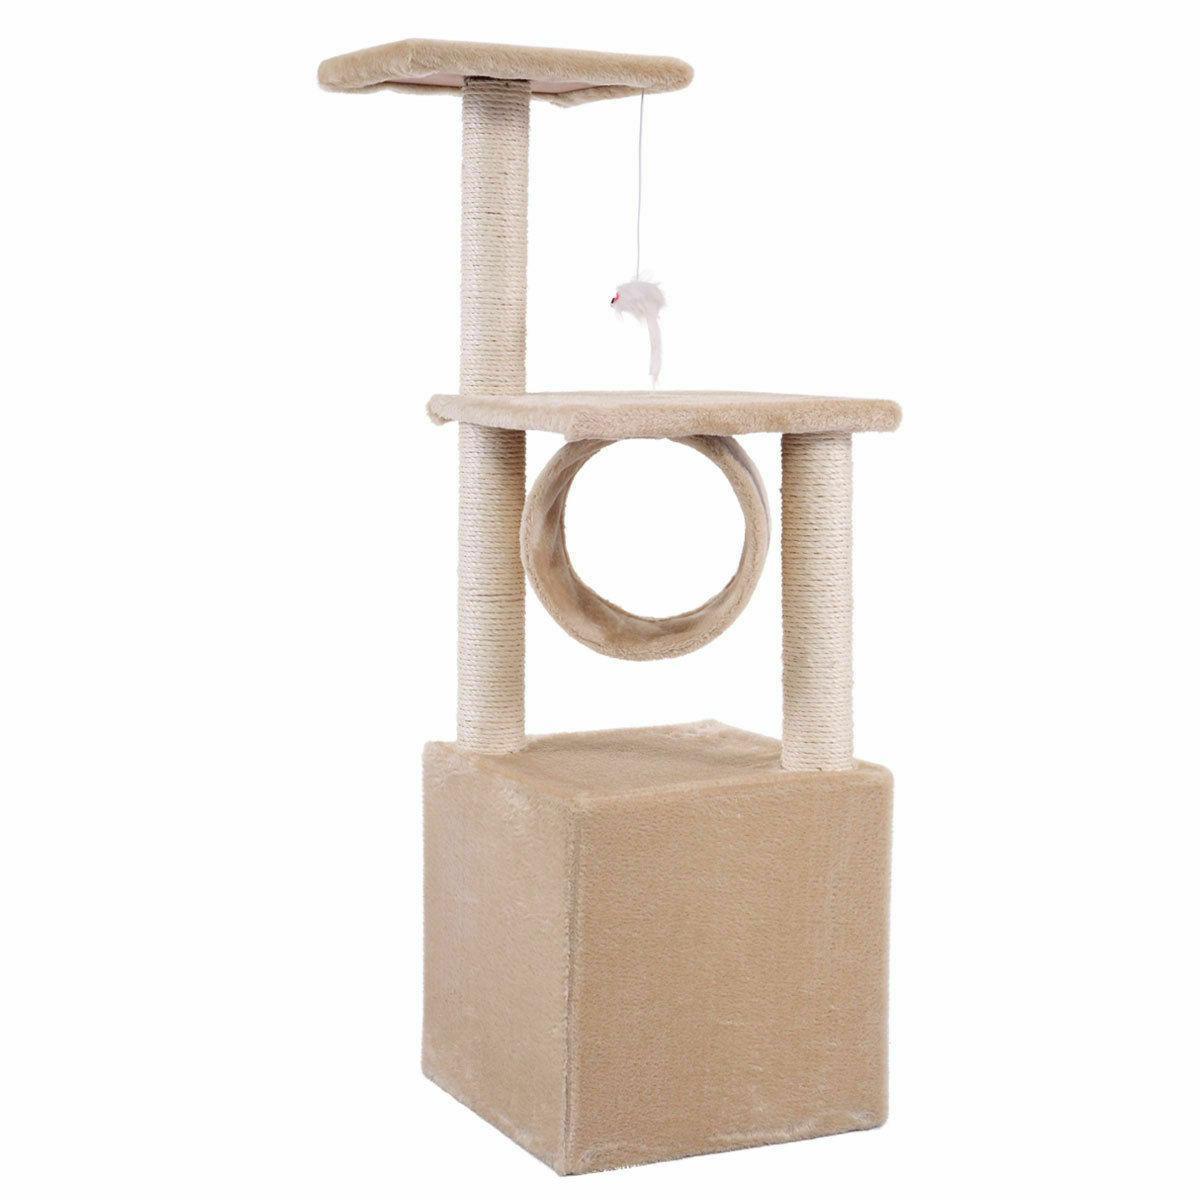 Deluxe Cat Condo Kitten Pet House with